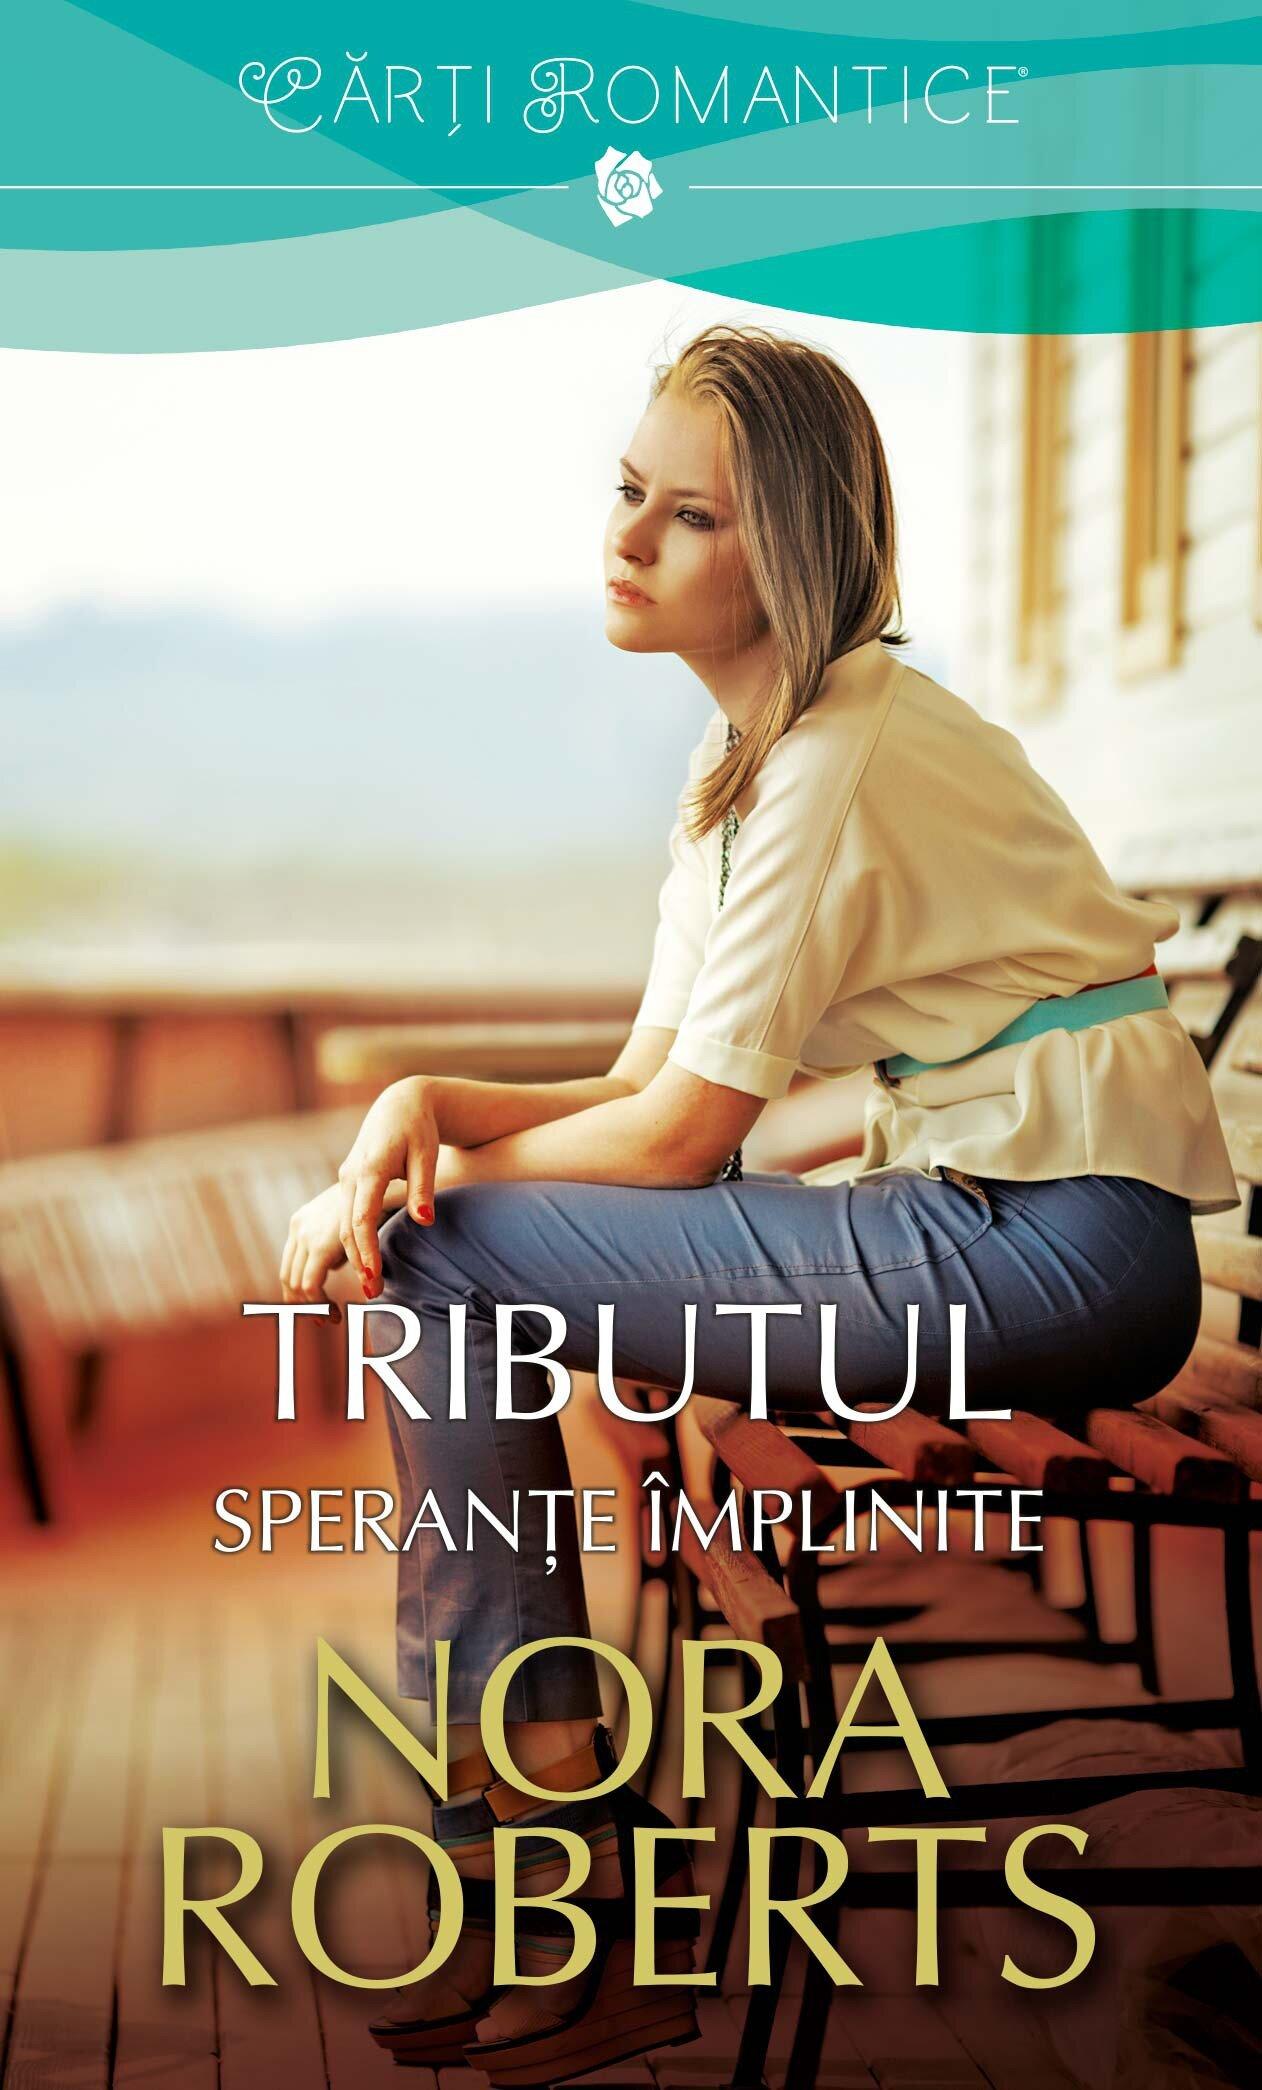 Tributul. Vol. 2 - Sperante implinite PDF (Download eBook)